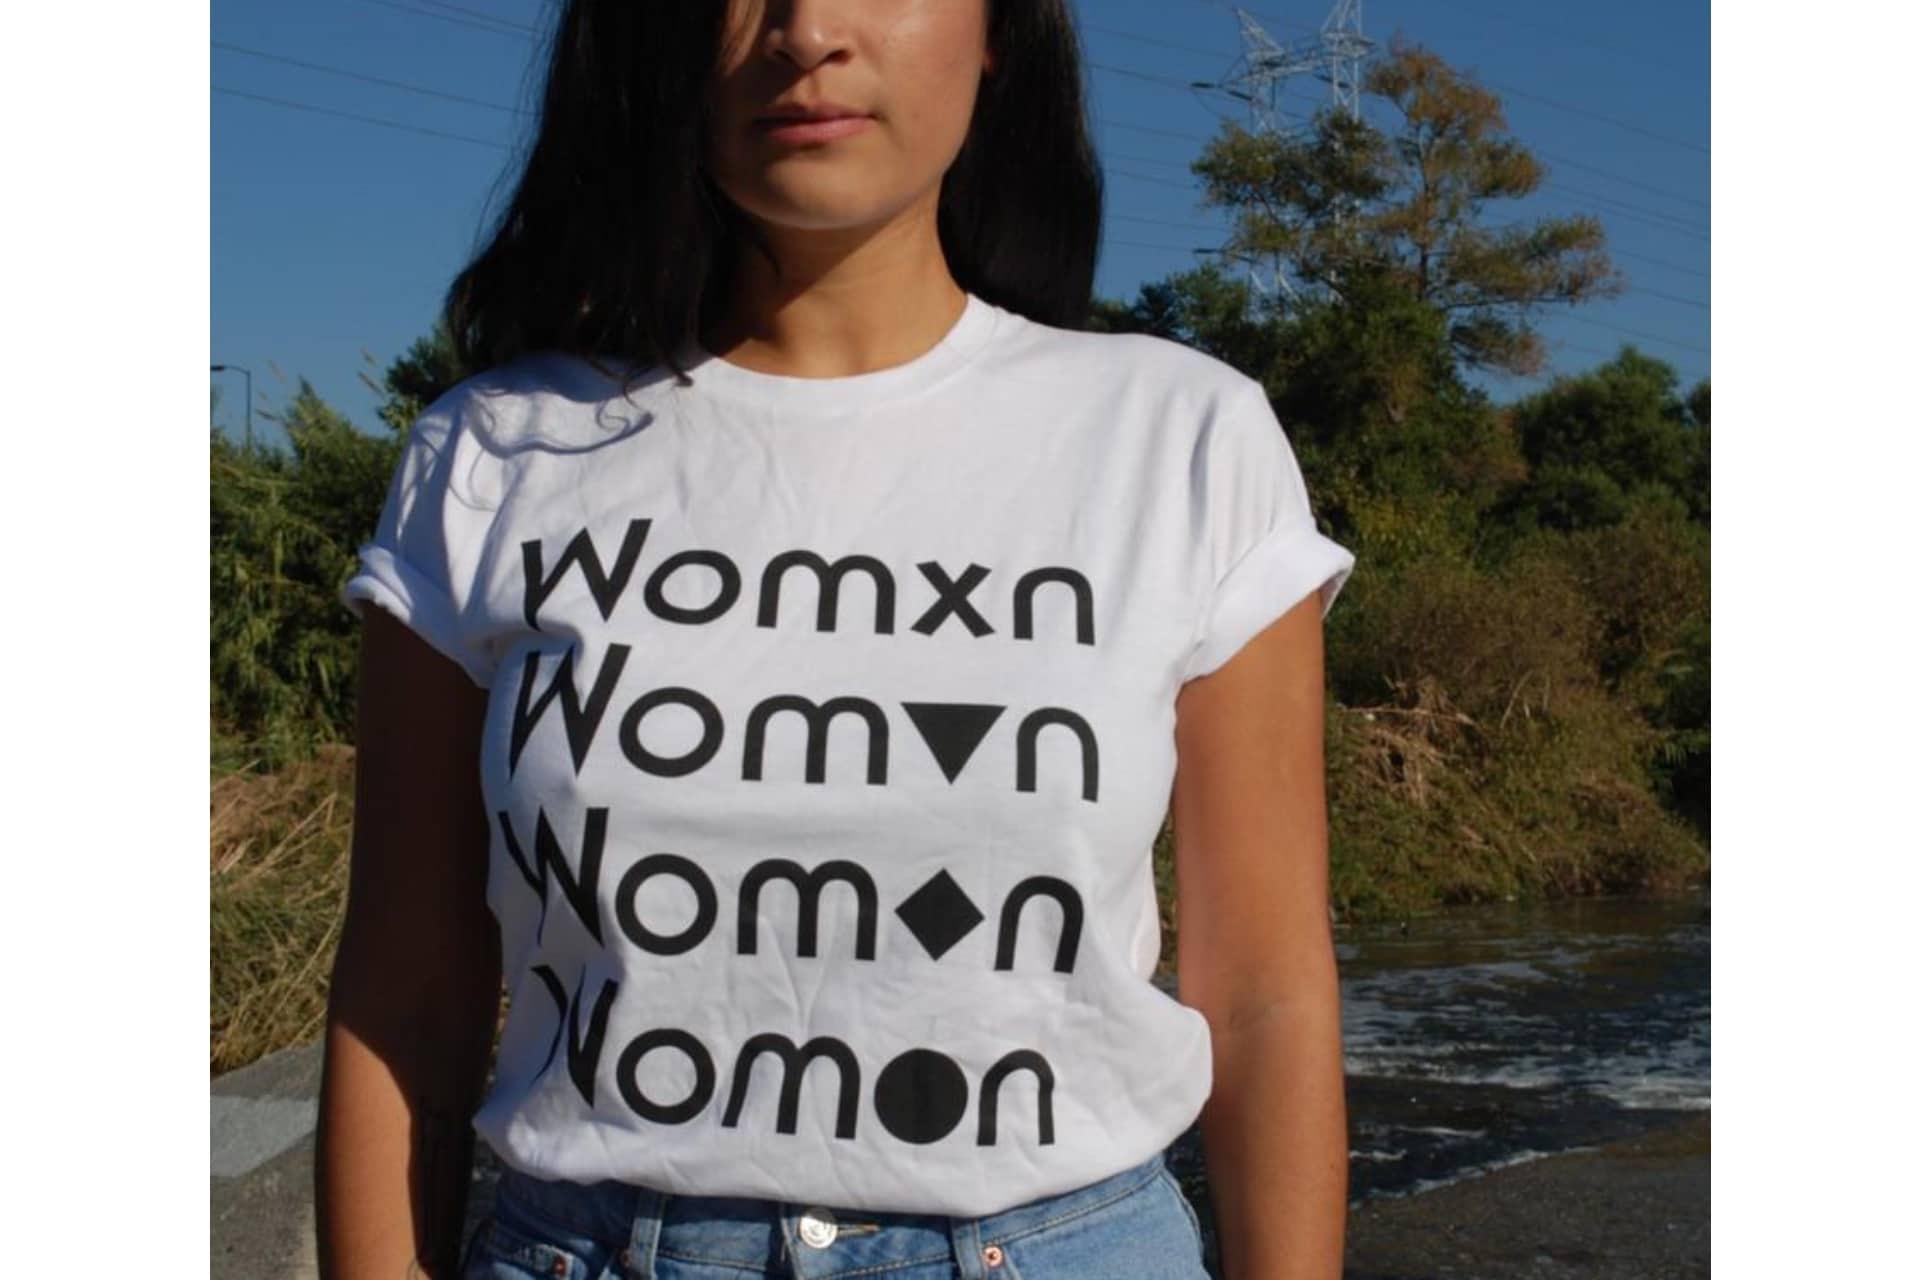 women wearing a whit tshirt that says womxn